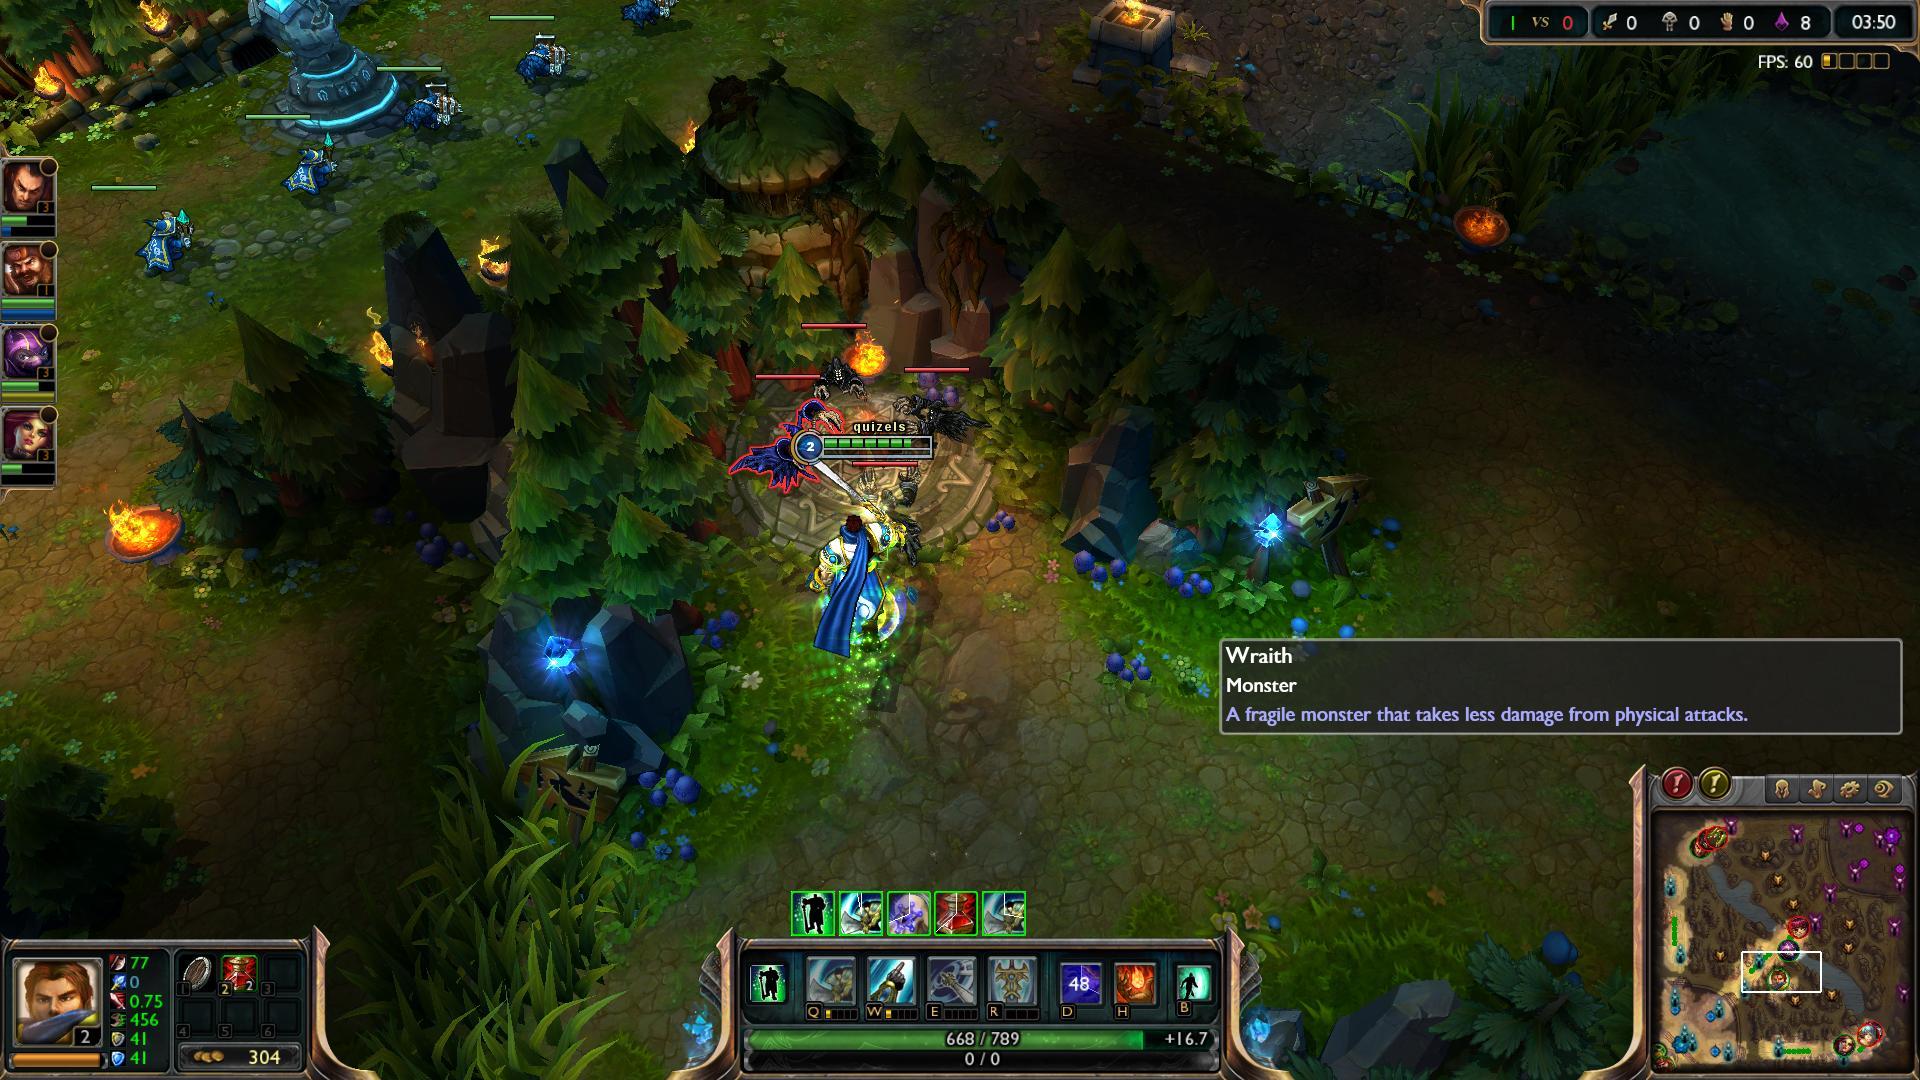 Wraith League of Legends lol screenshot - Gamingcfg.com